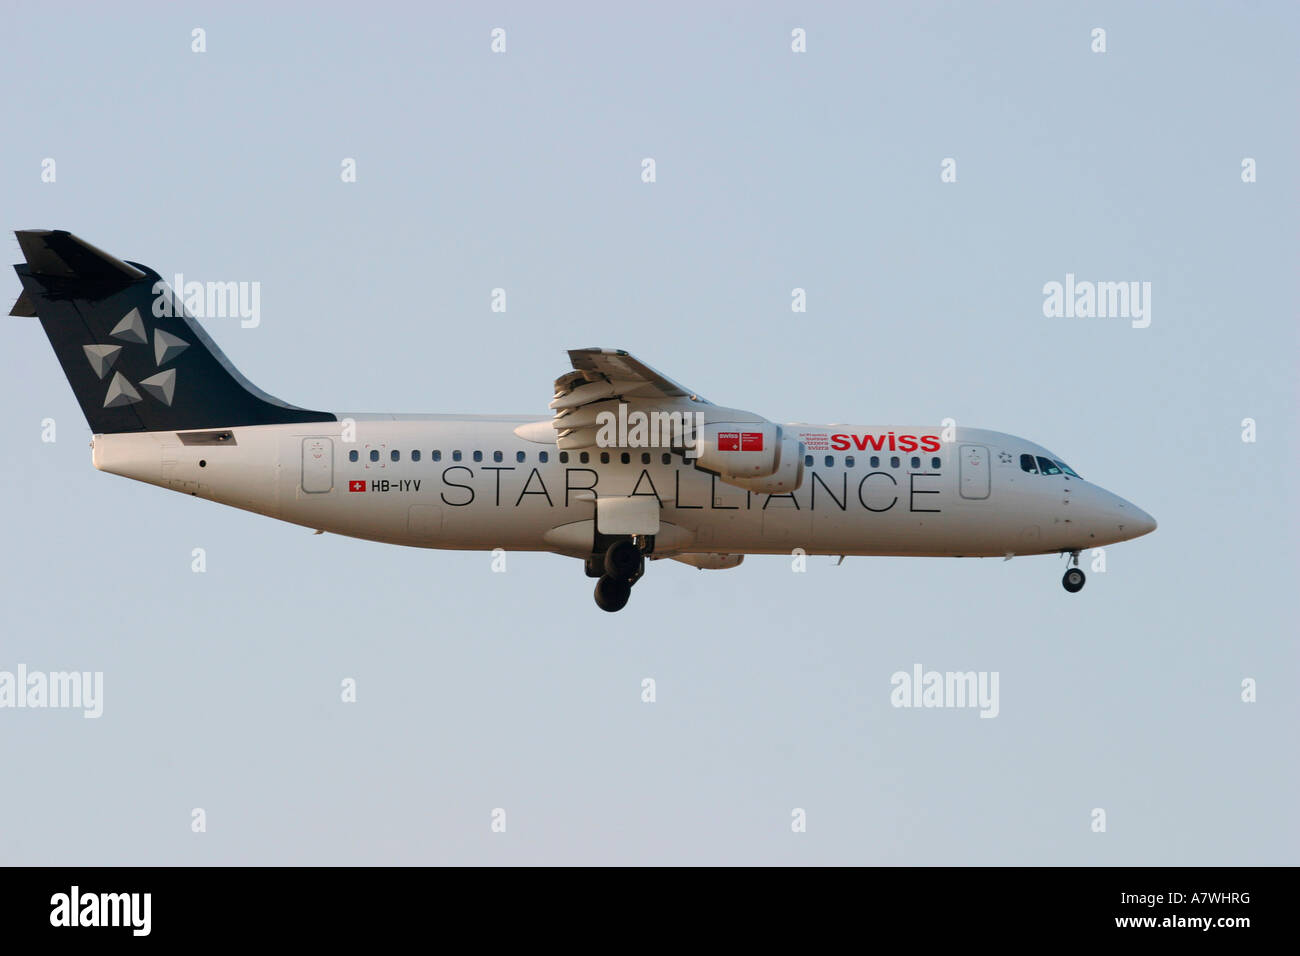 Airplane British Aerospace BAe 146-300 of the Swiss Star Alliance landing - Stock Image